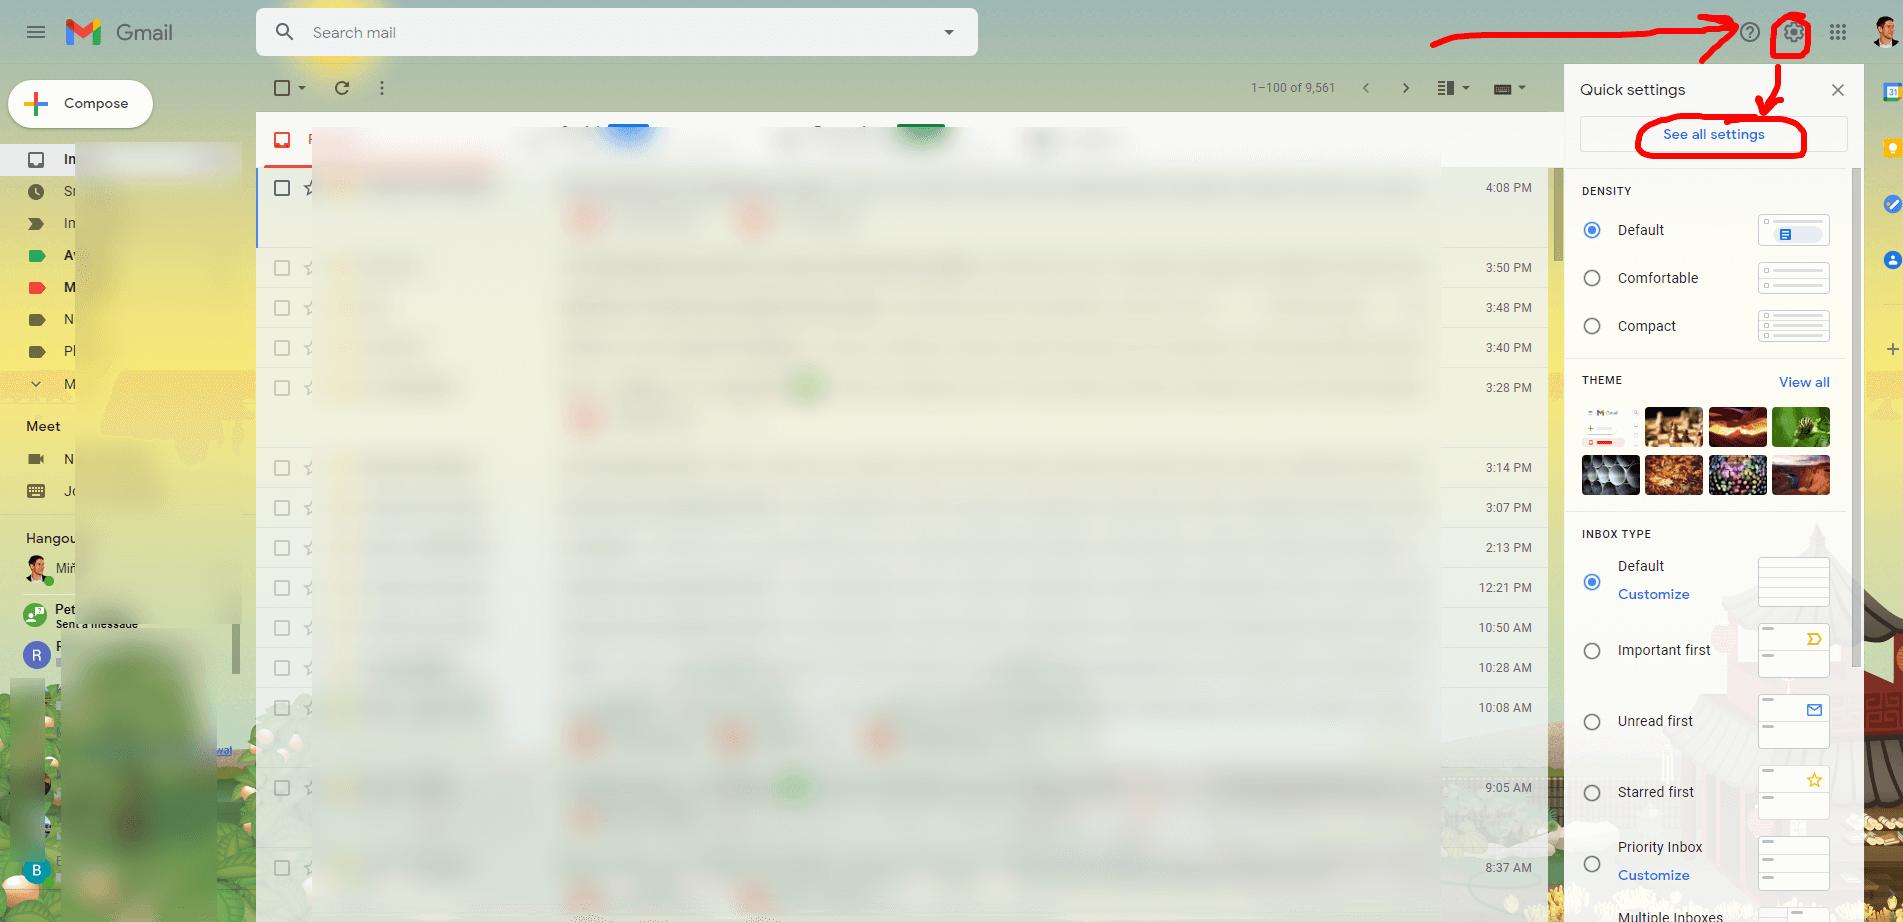 nastavenie prijímania emailov cez gmail SMTP